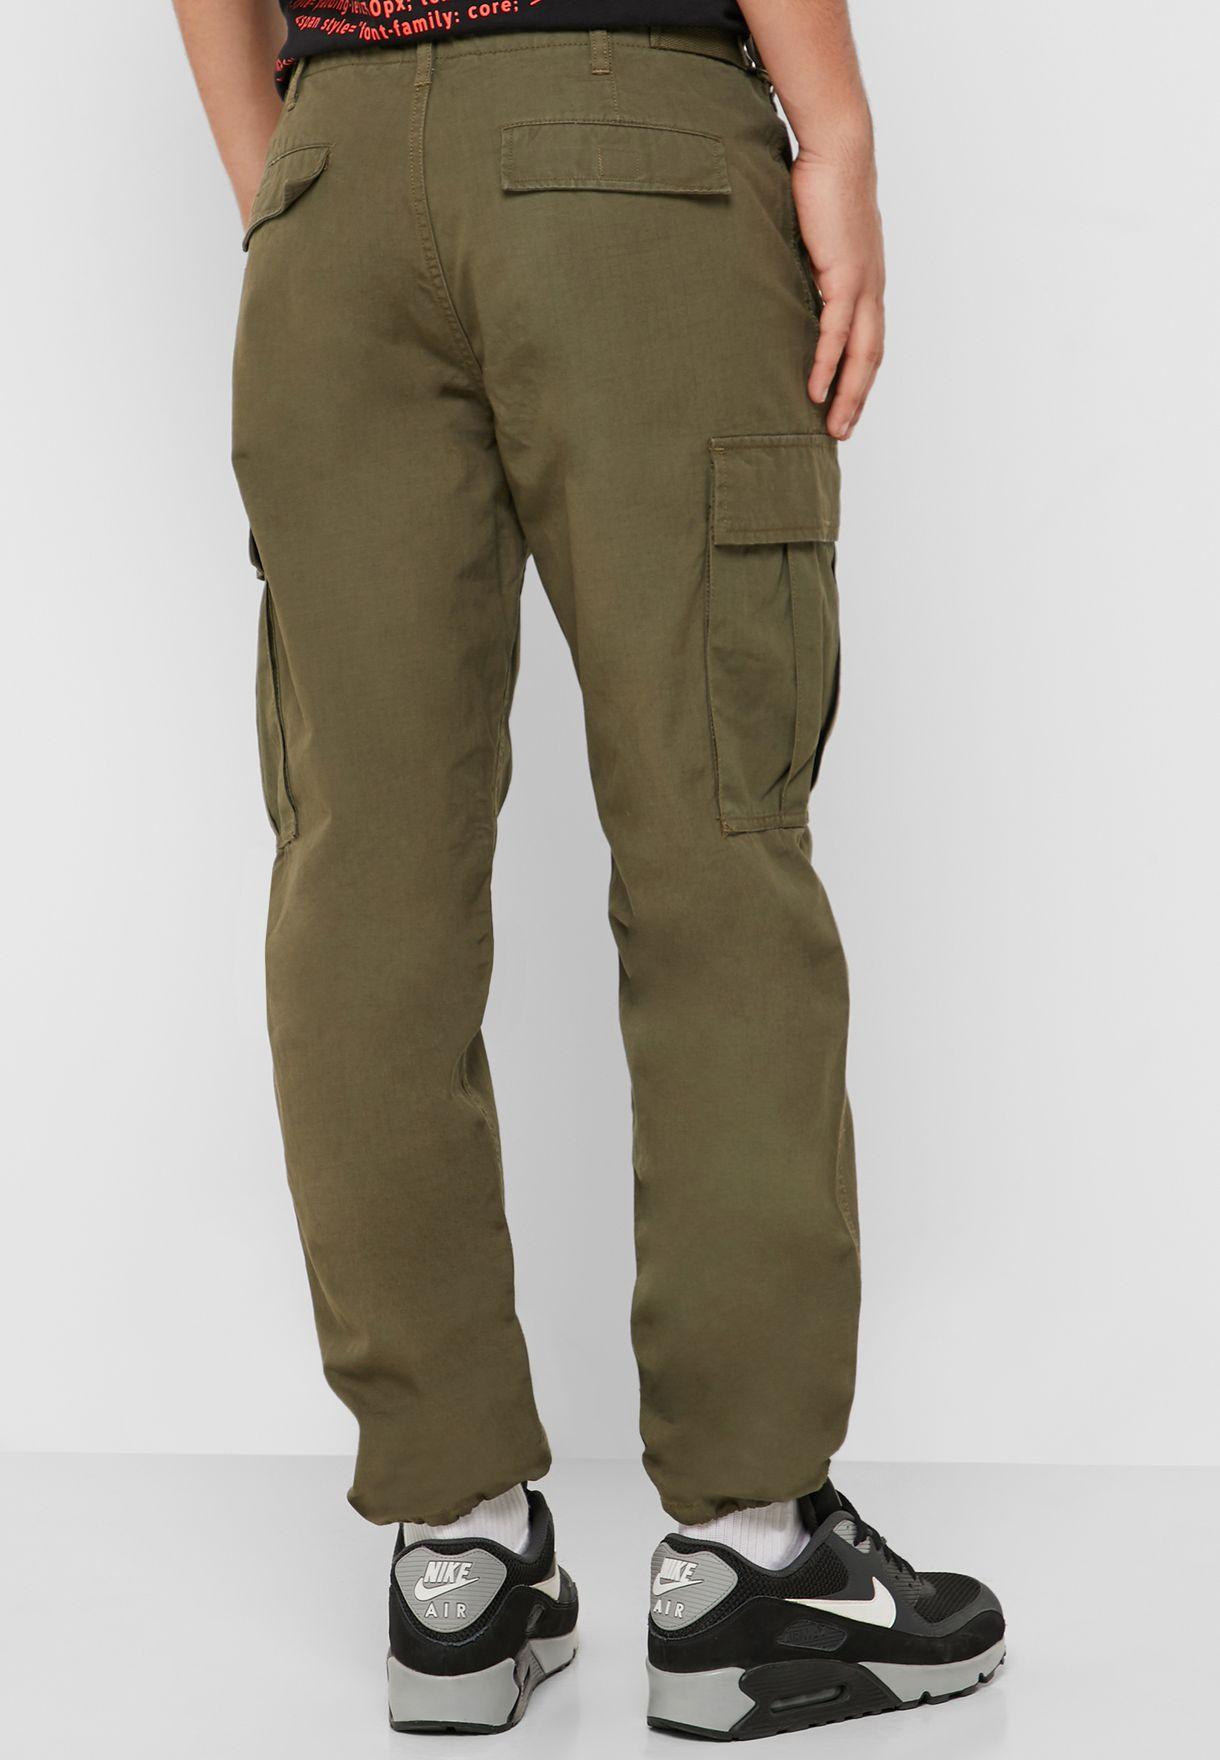 Ace Charlie Cargo Pants